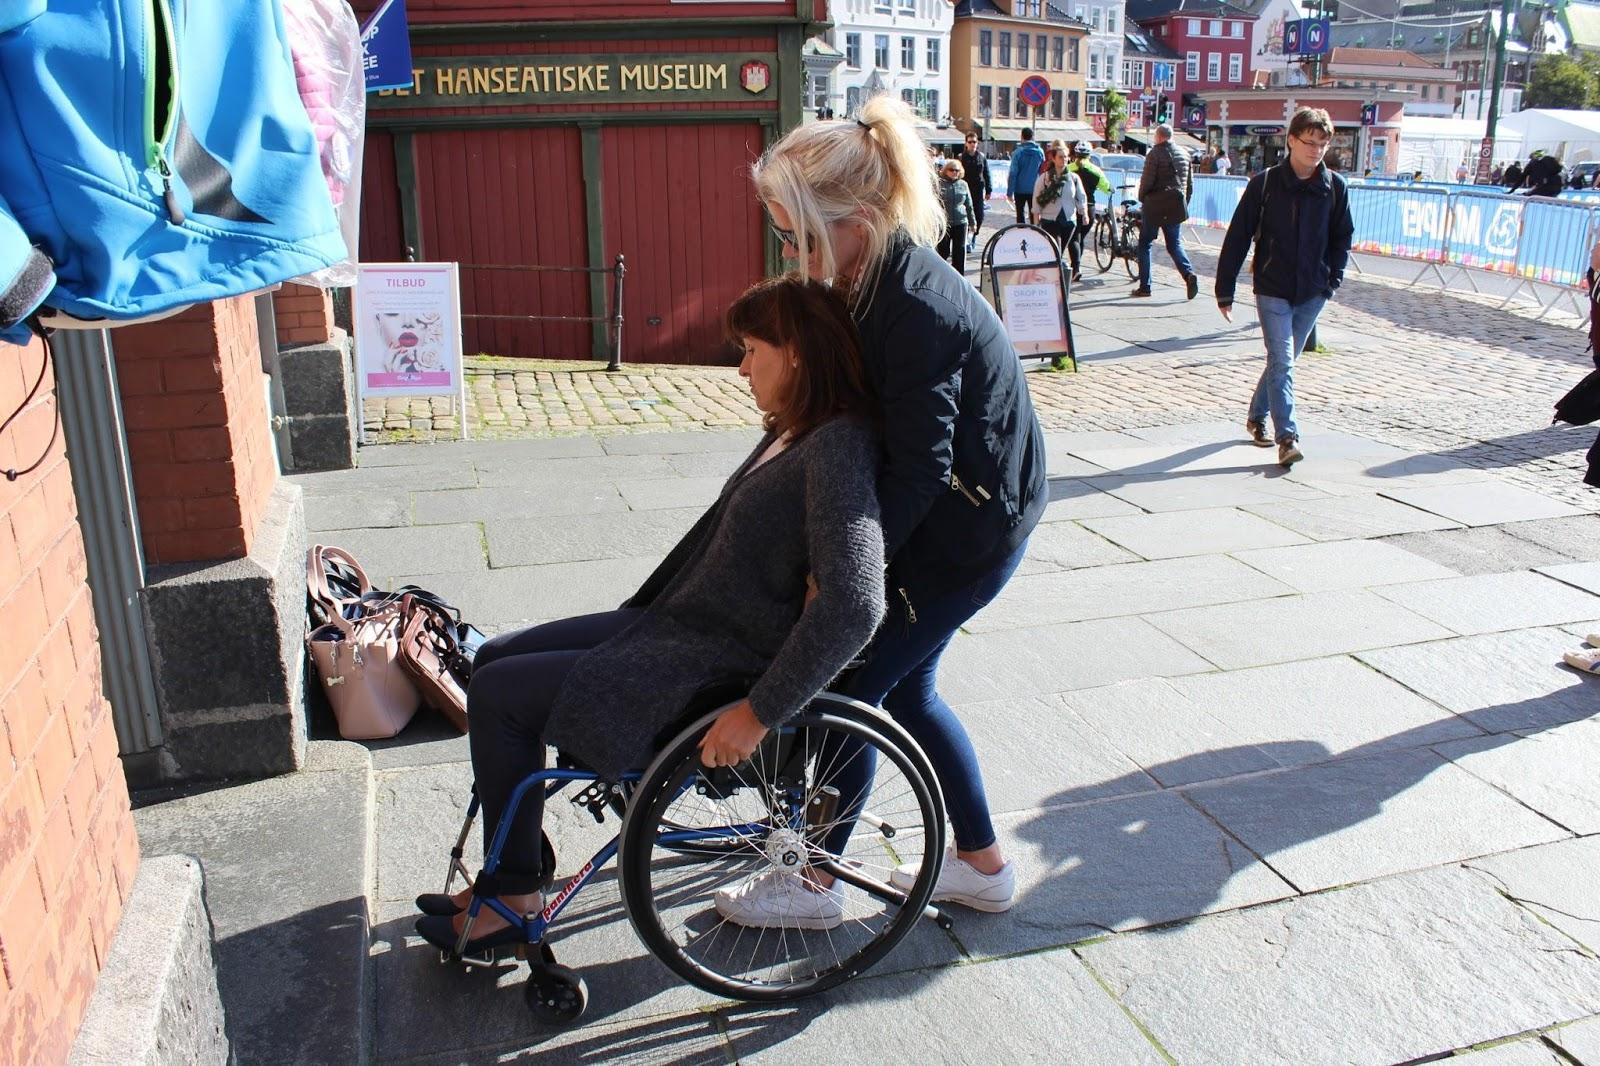 Bilde av Bergens varaordfører Marita Moltu i rullestol som får assistanse inn i en bygning av en assistent fra Prima Assistanse.